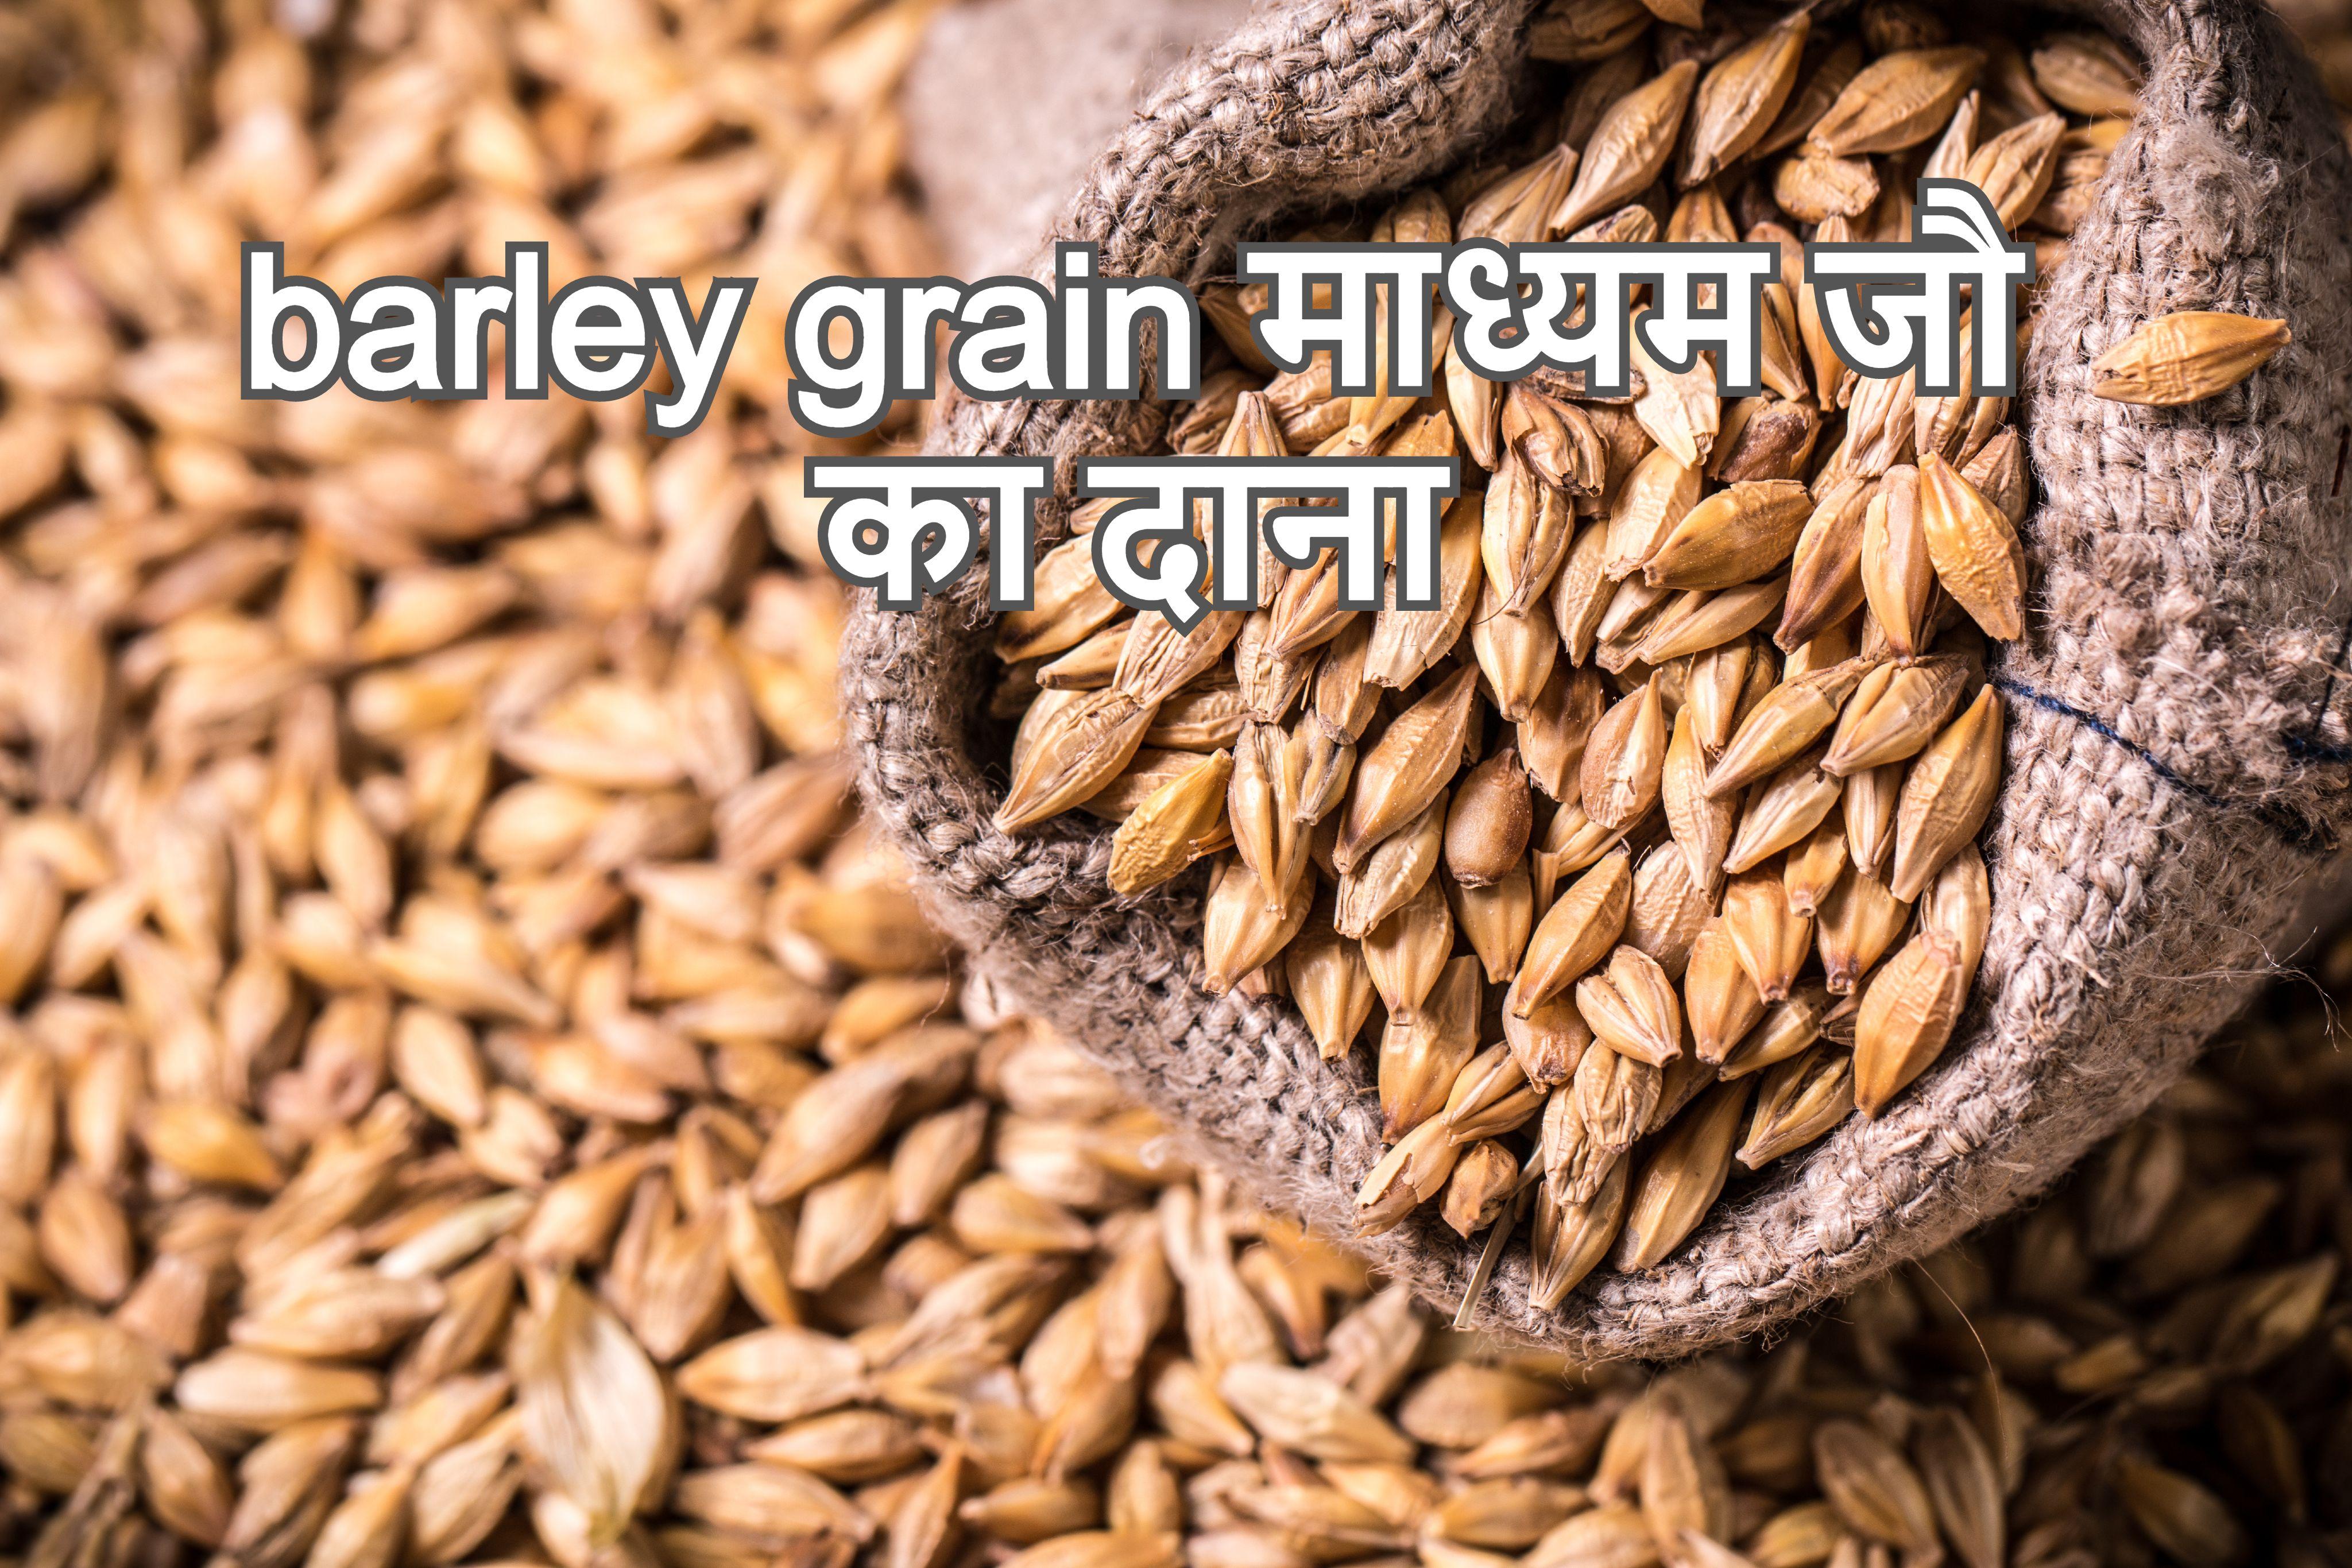 जो के साइड इफेक्ट्स और सुरक्षा [Barley's side effects and safety